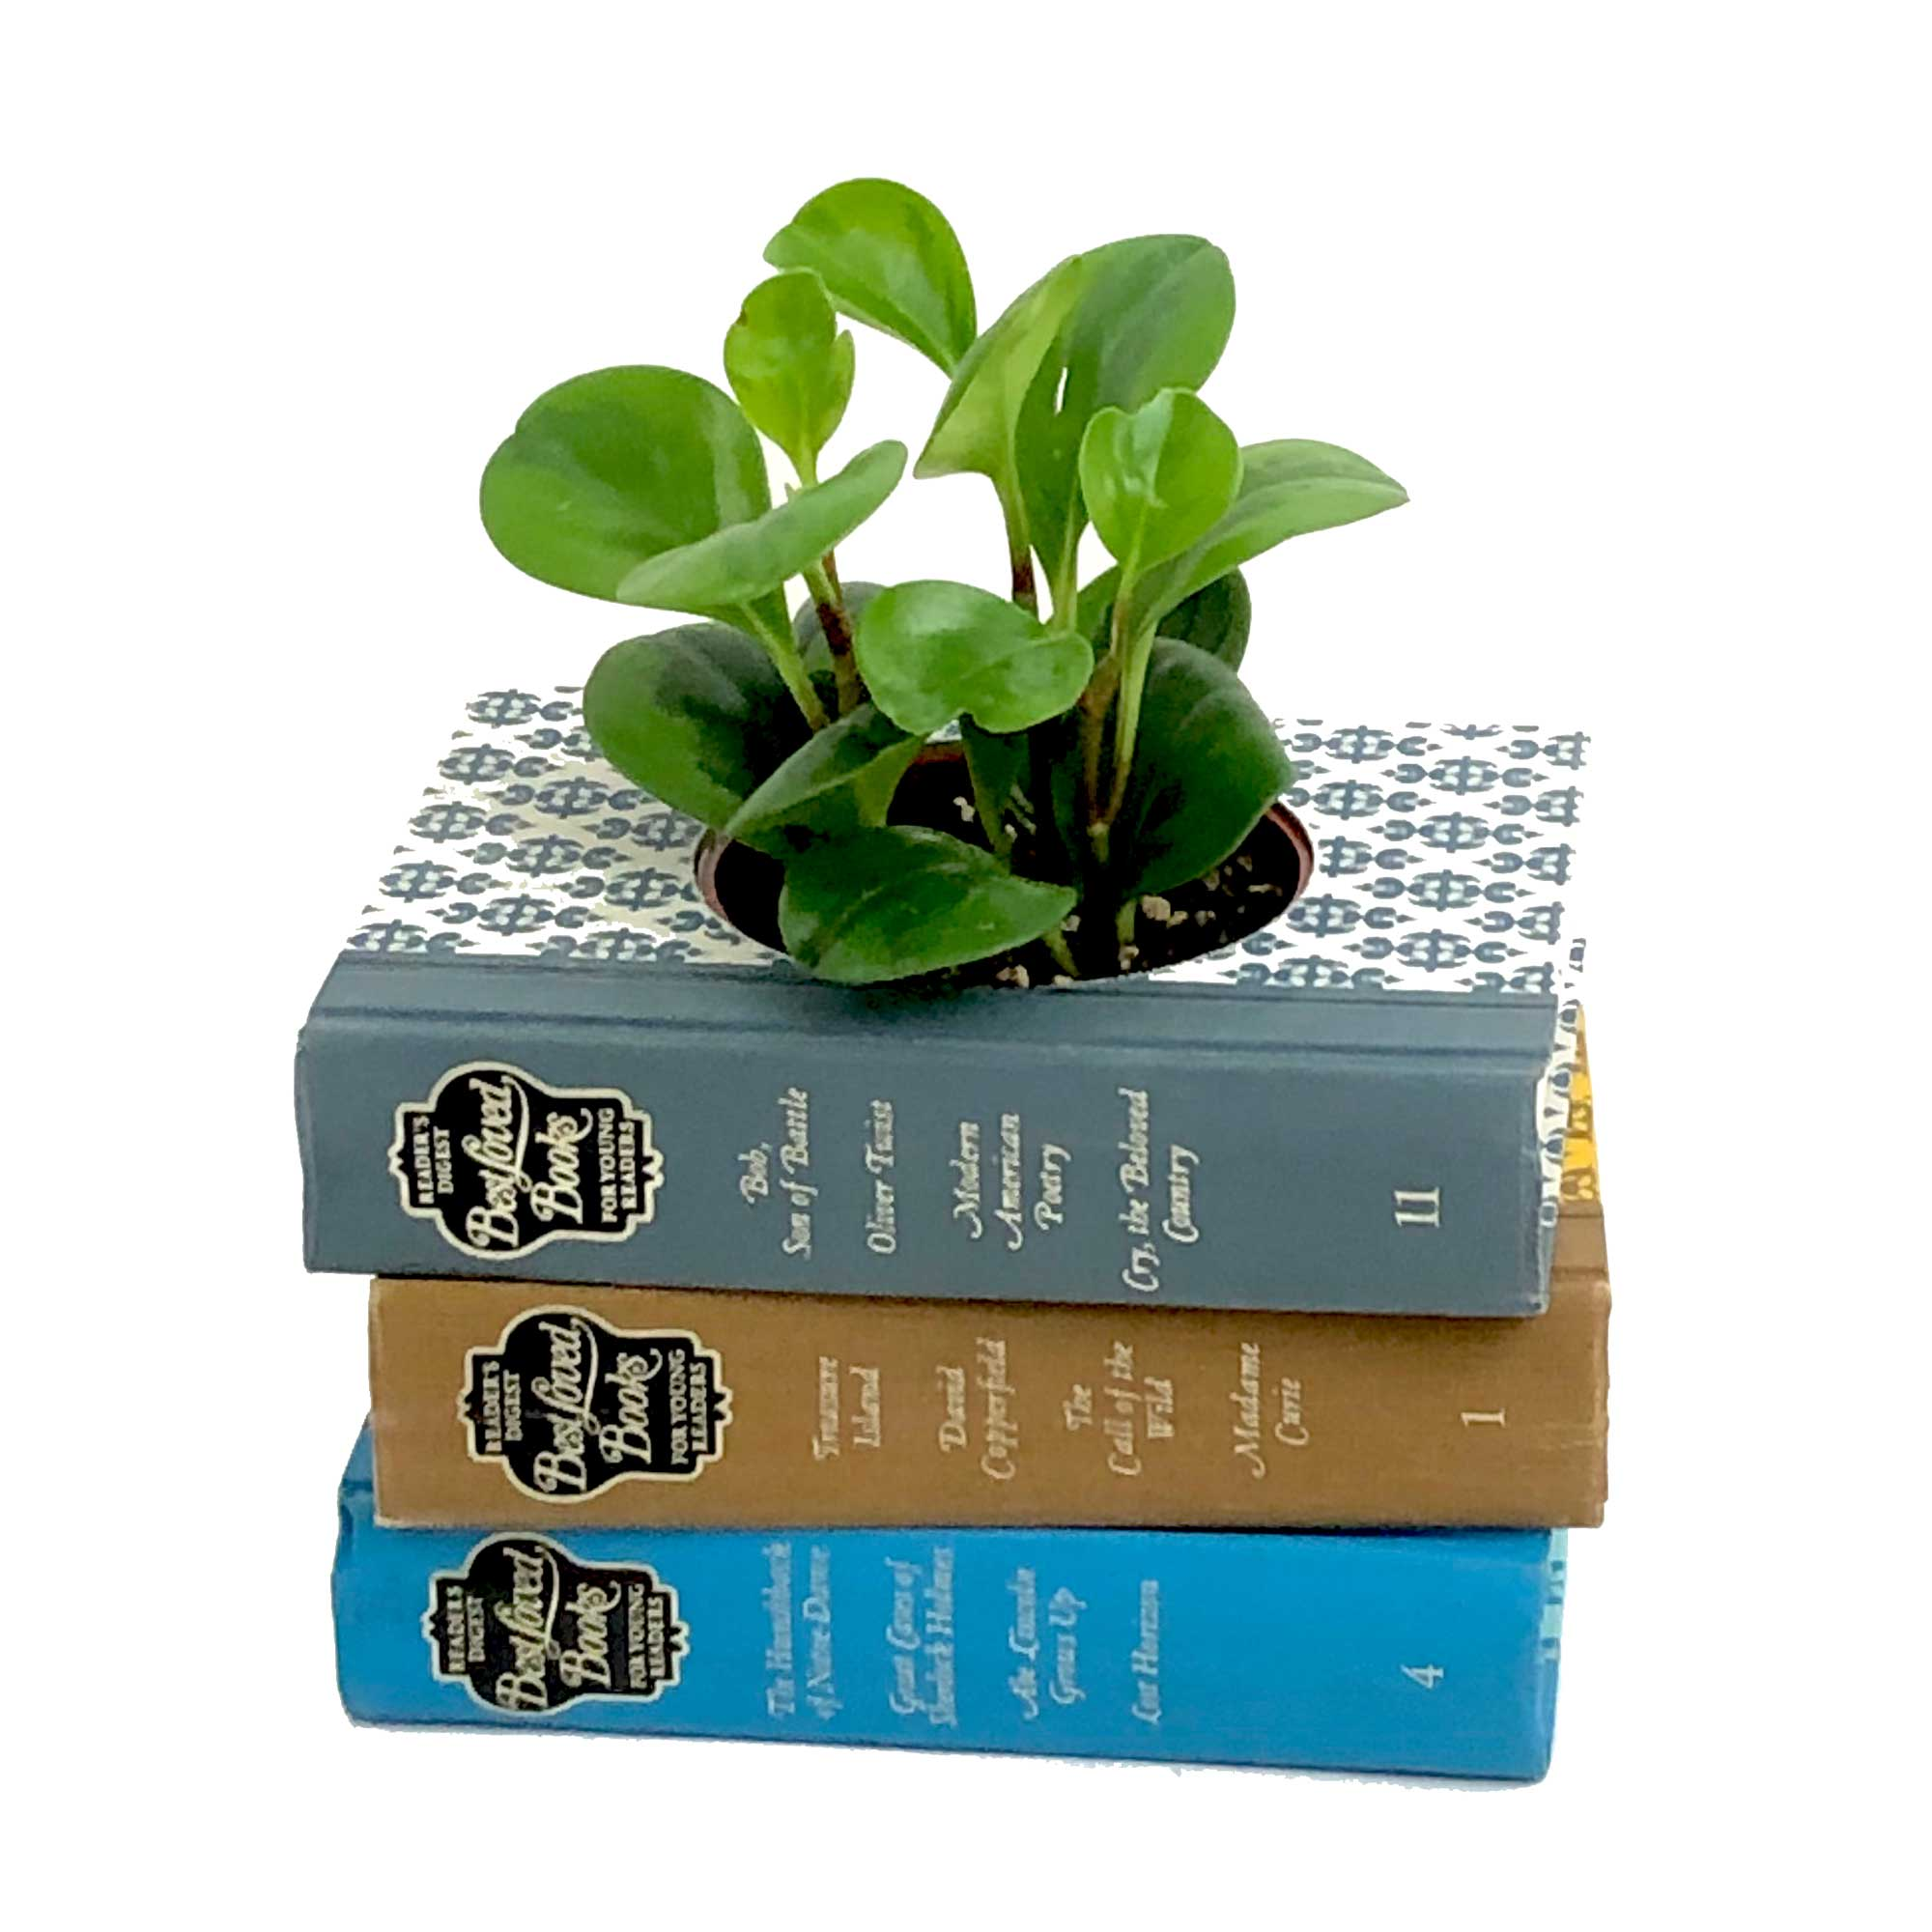 centerpieces-using-books